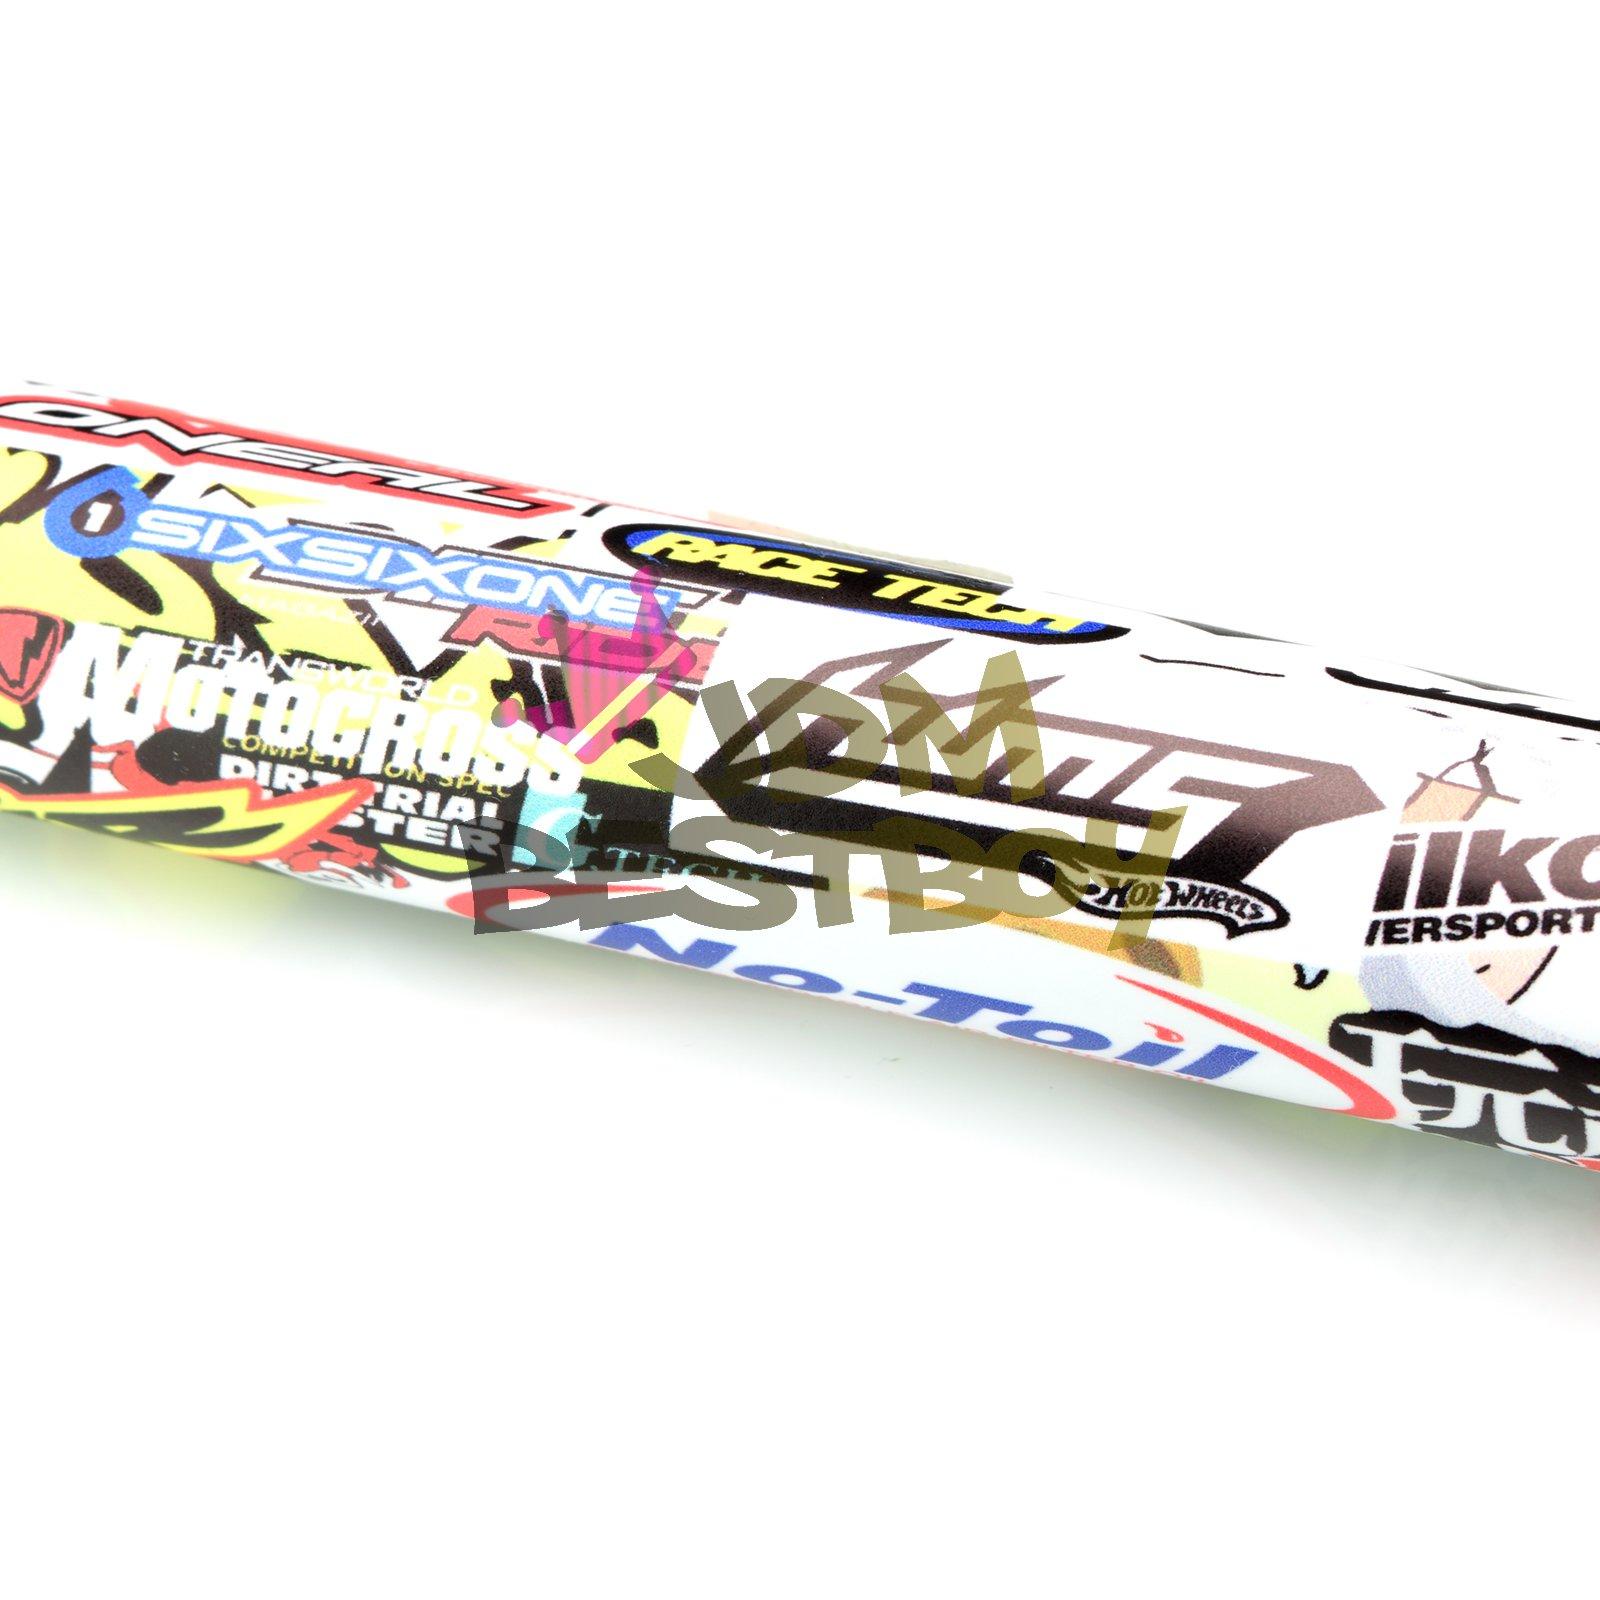 Free Tool Kit LION JDM Bomber Racing Graffiti Brand Car Auto Laptop Vinyl Wrap Sticker Decal Film Sheet - 60''X600'' by JDMBESTBOY (Image #2)